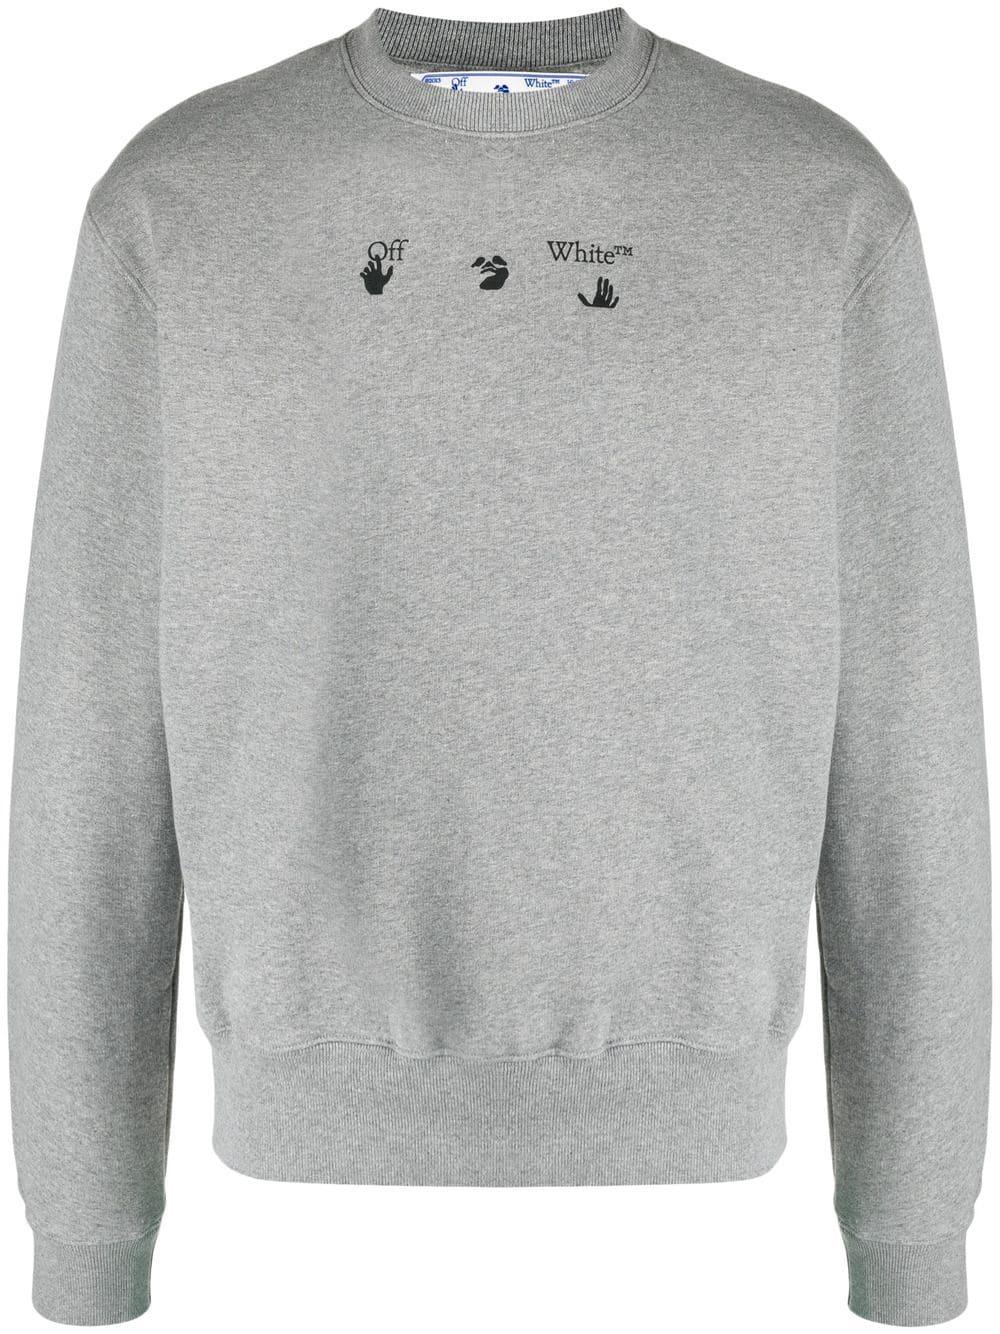 <p class='small-title'>OFF WHITE</p>Sweatshirt